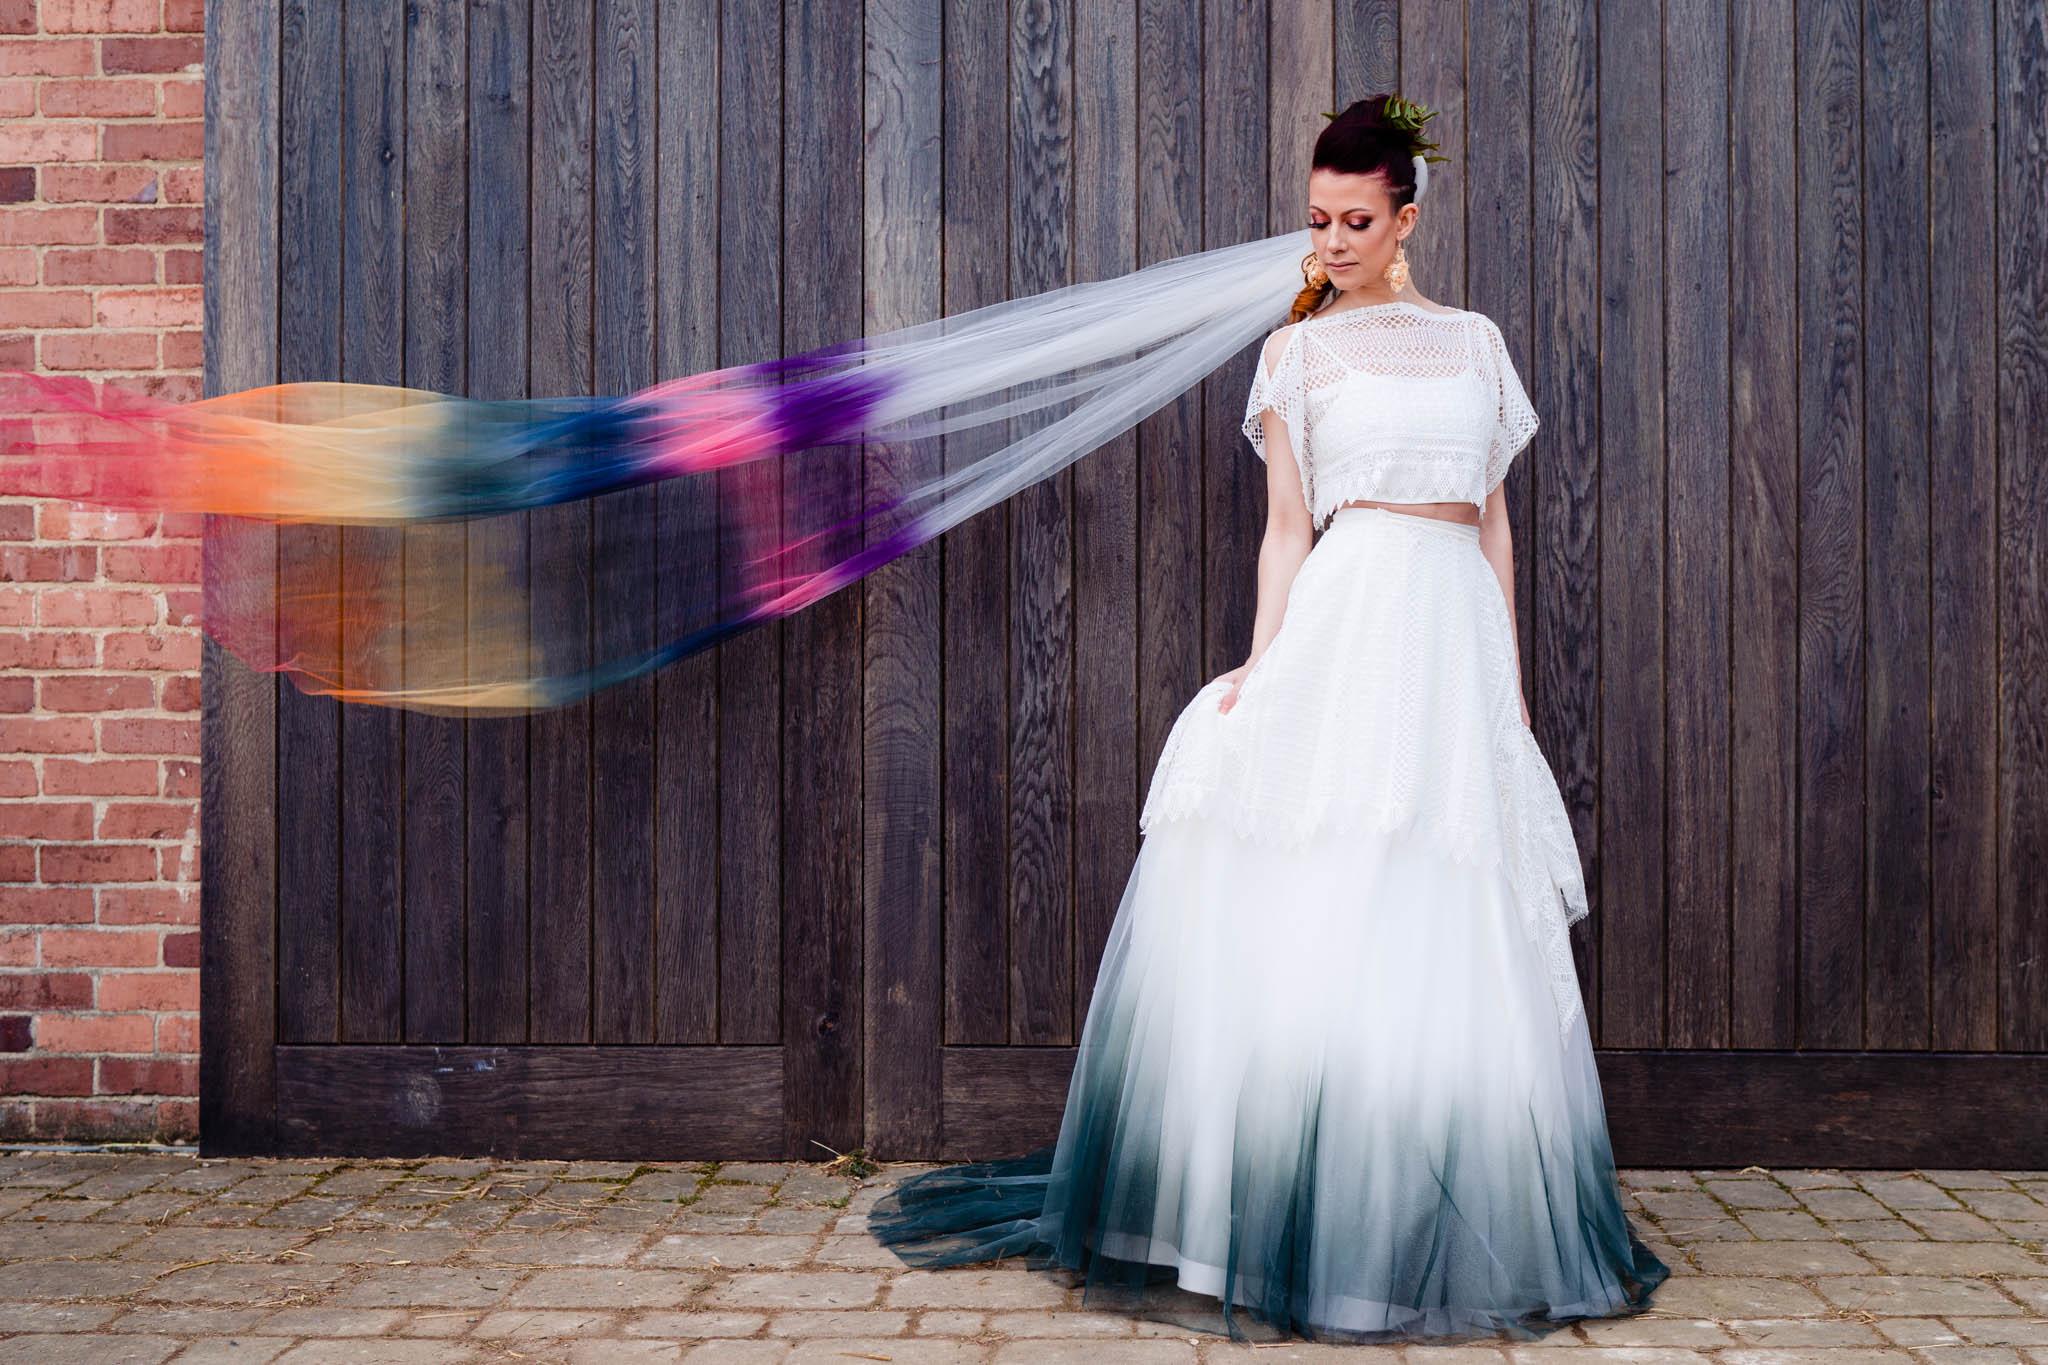 rainbow ombre veil - ombre wedding dress - tie dye wedding dress